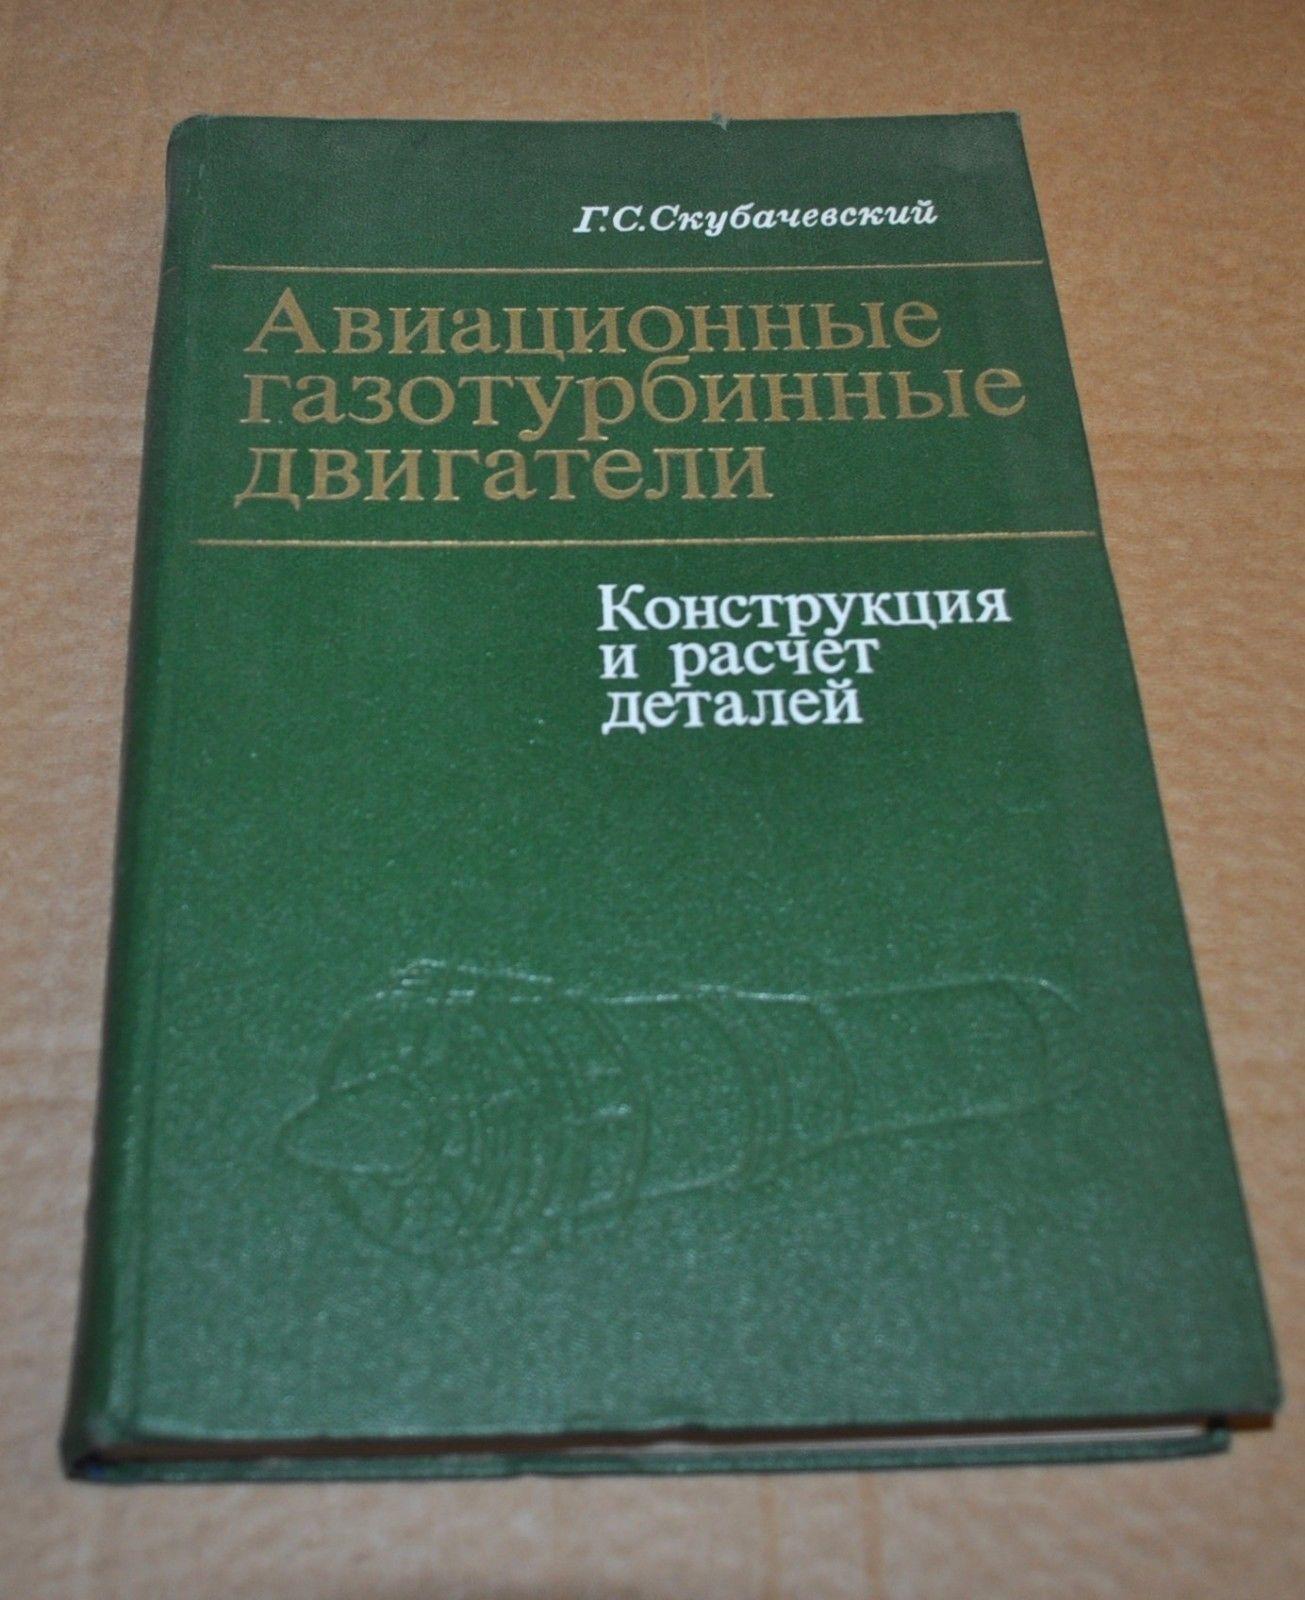 Aircraft Gas Turbine Engines Manual Aeroflot Soviet Book AUTO